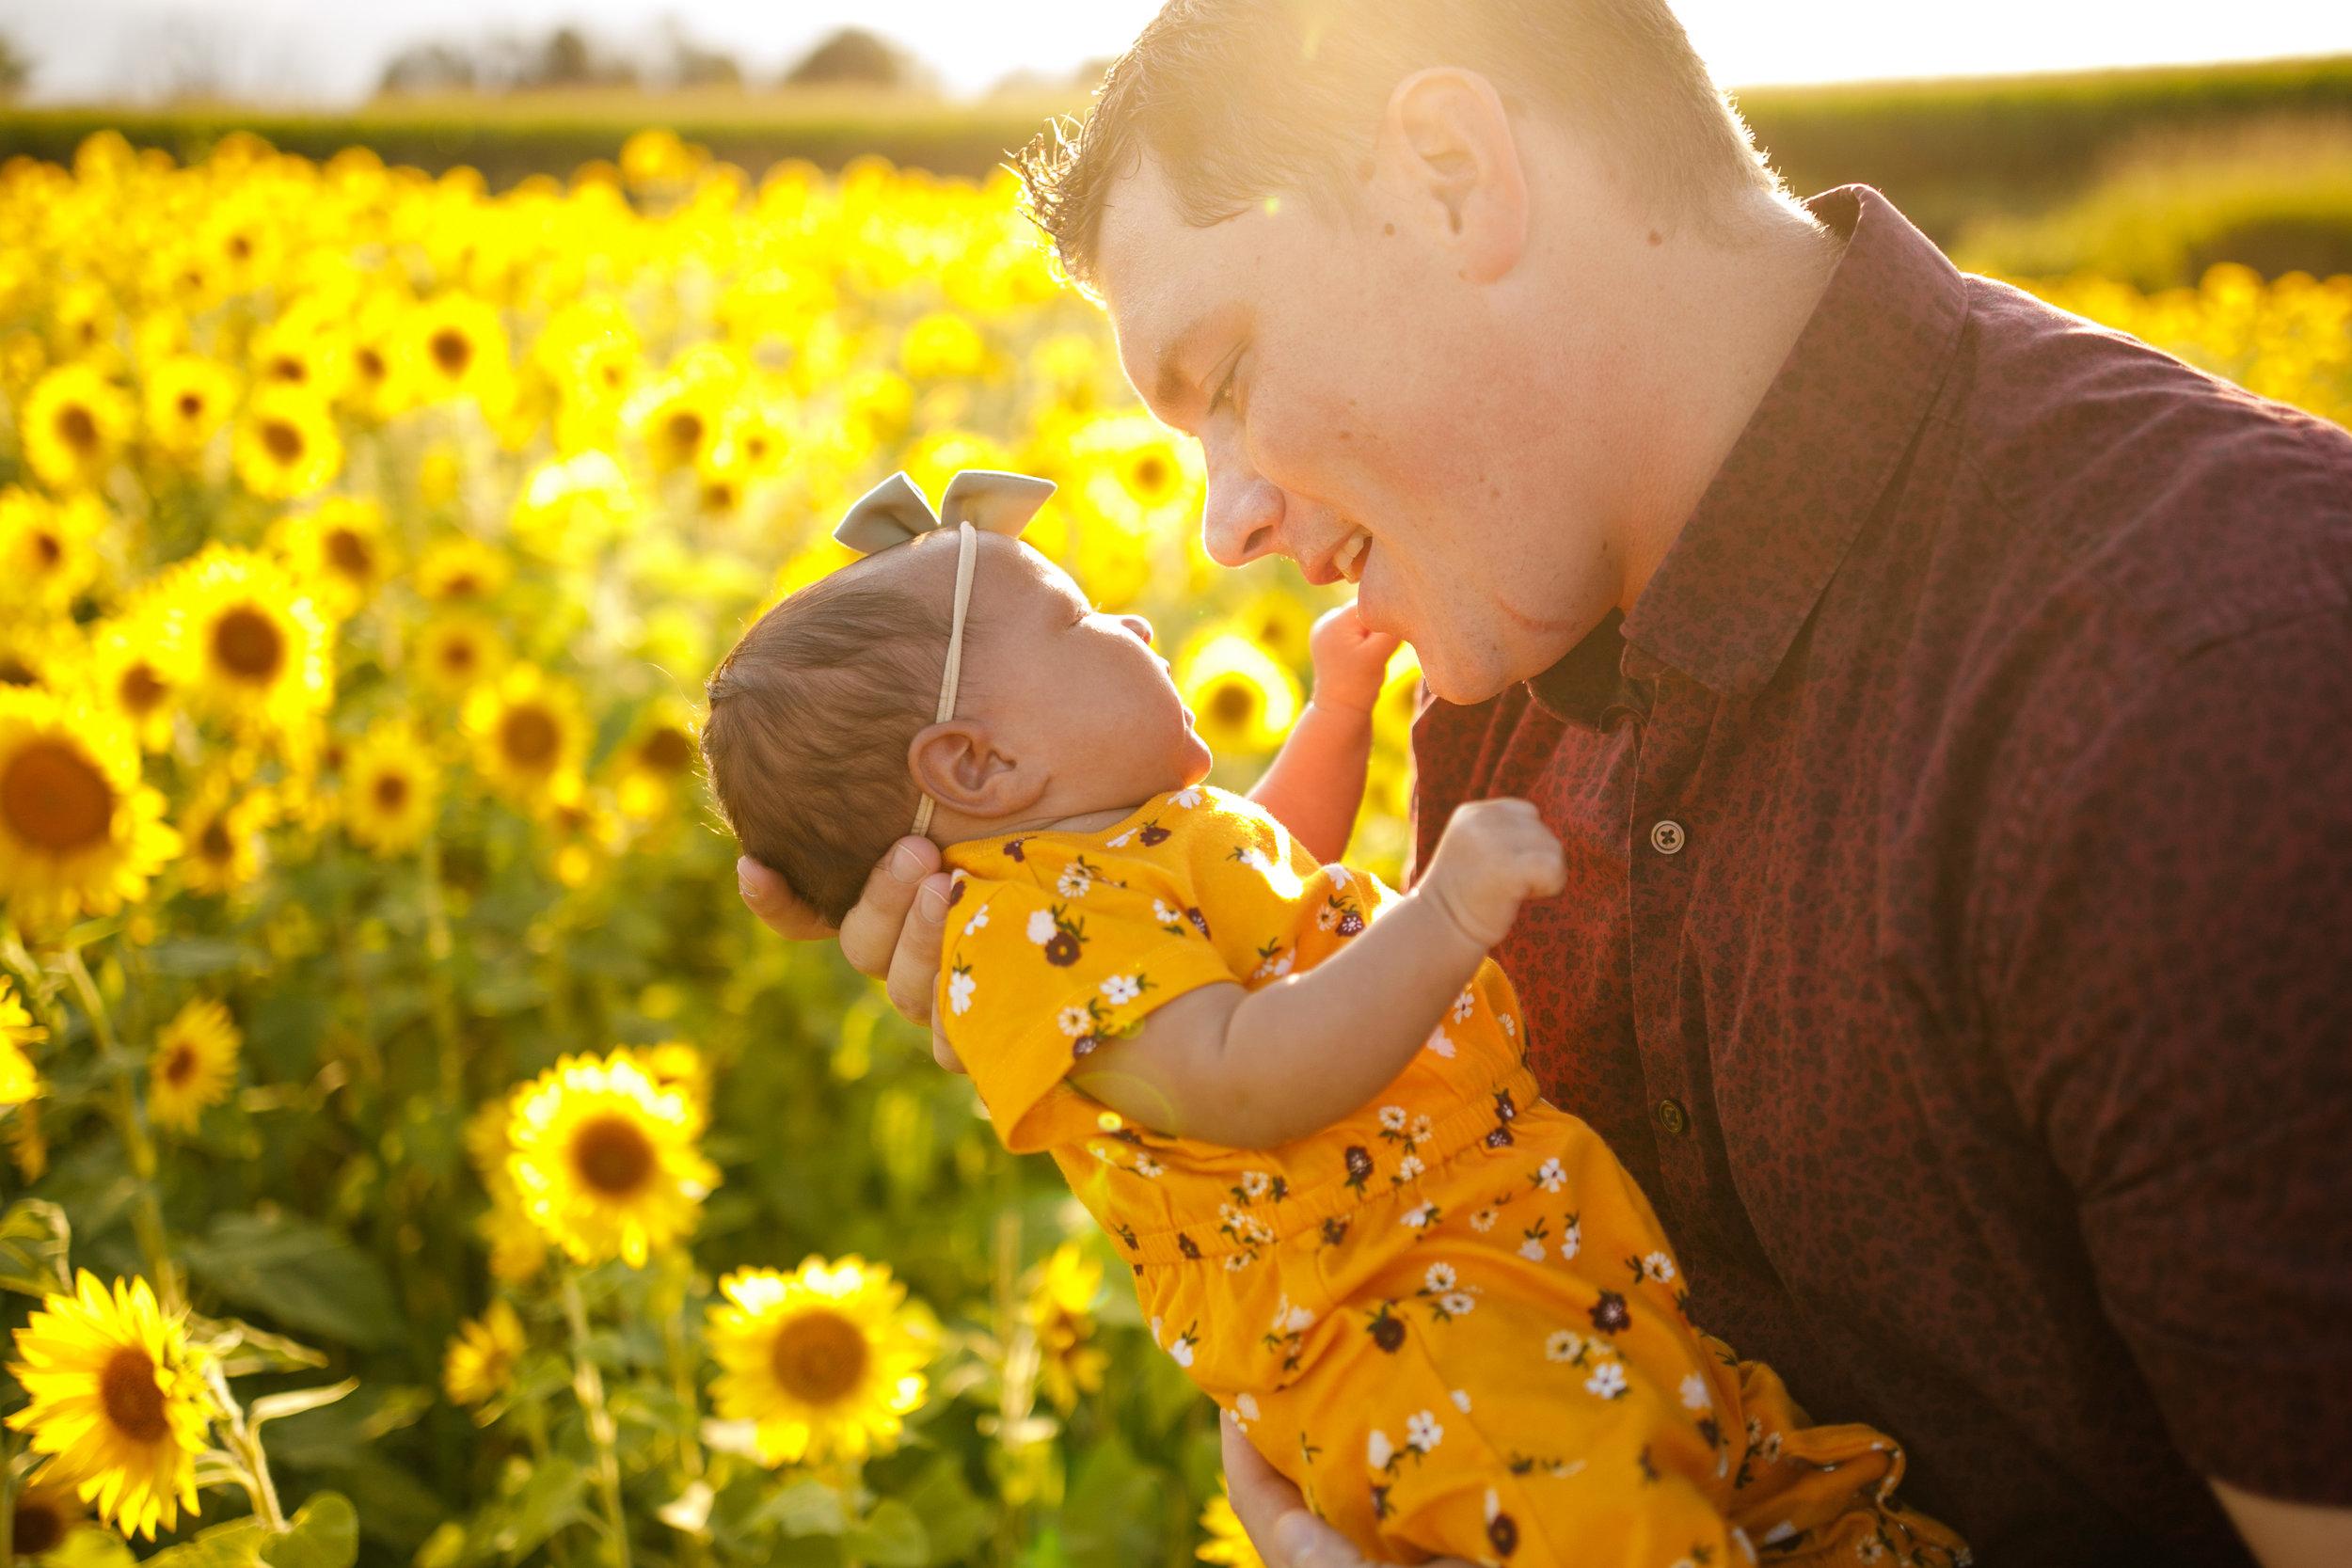 Morris Family Summer 2019 - Grand Rapids Photographer - Grand Rapids Family Photographer - Ed Dunneback and Girls - J Darling Photo 007.jpg